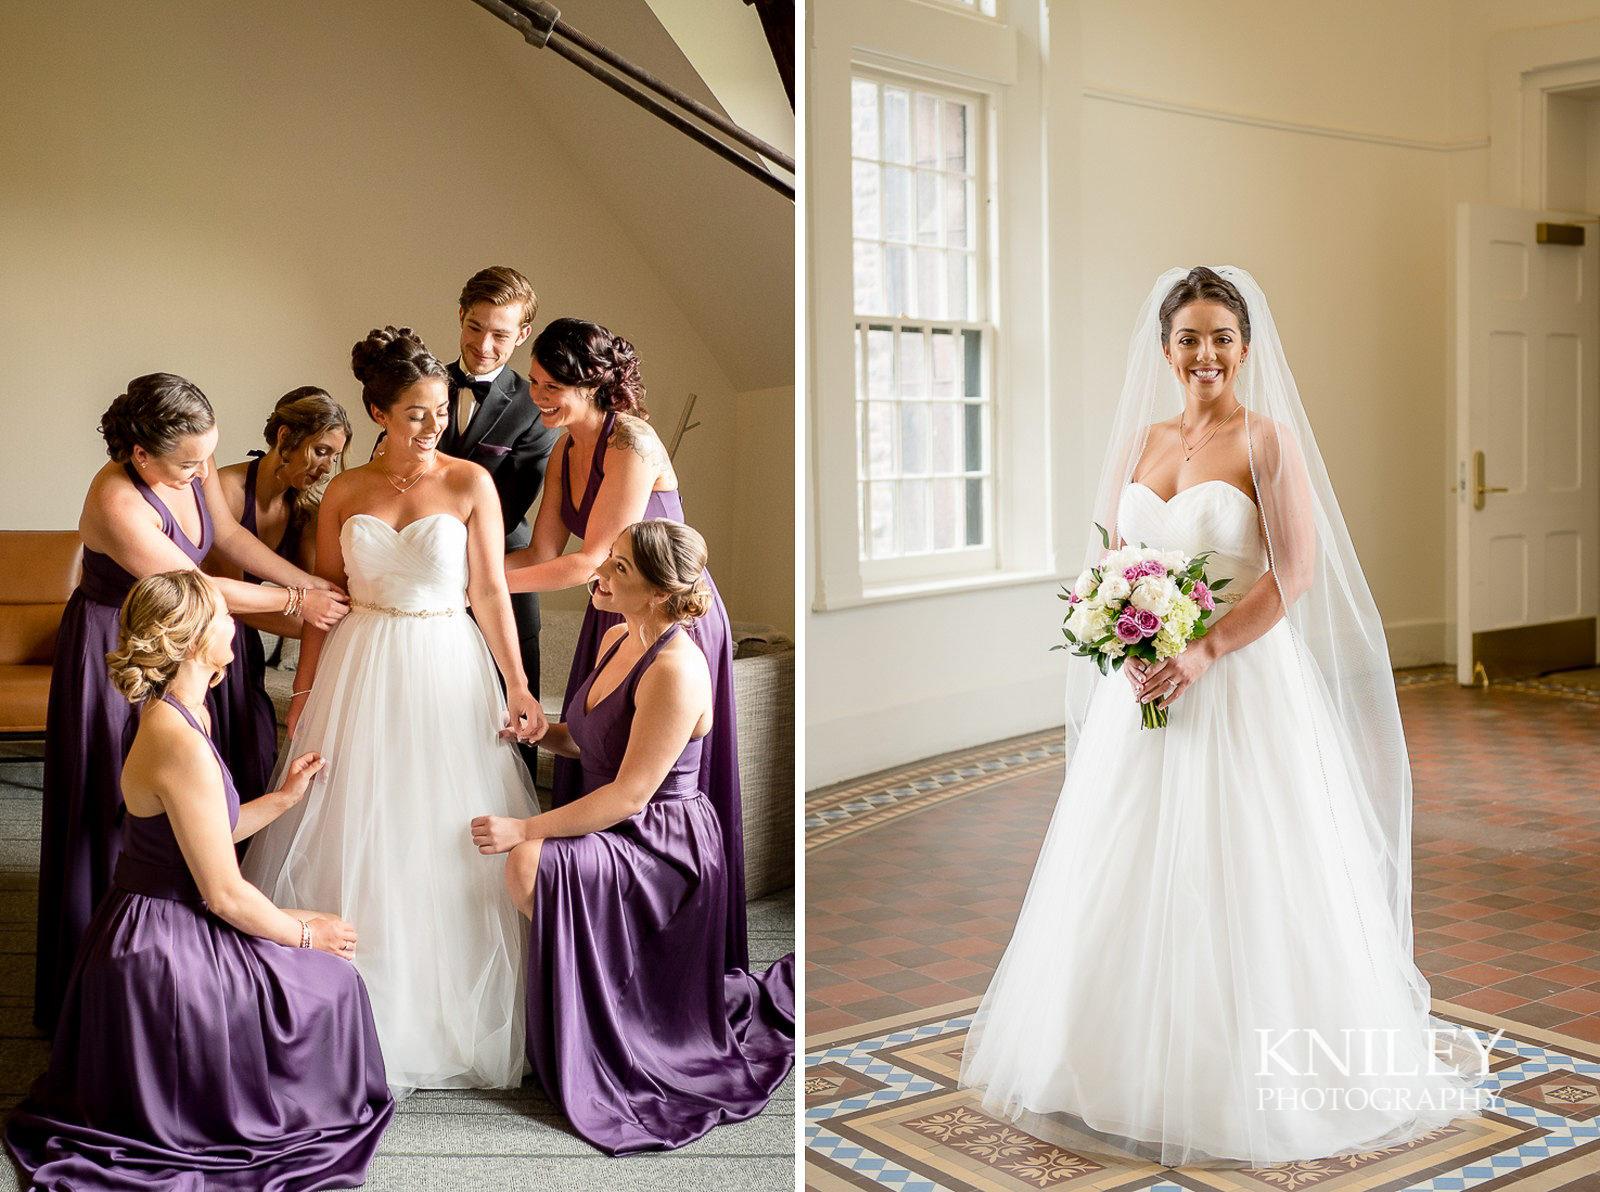 001 - Hotel Henry Buffalo NY Wedding Pictures 2.jpg